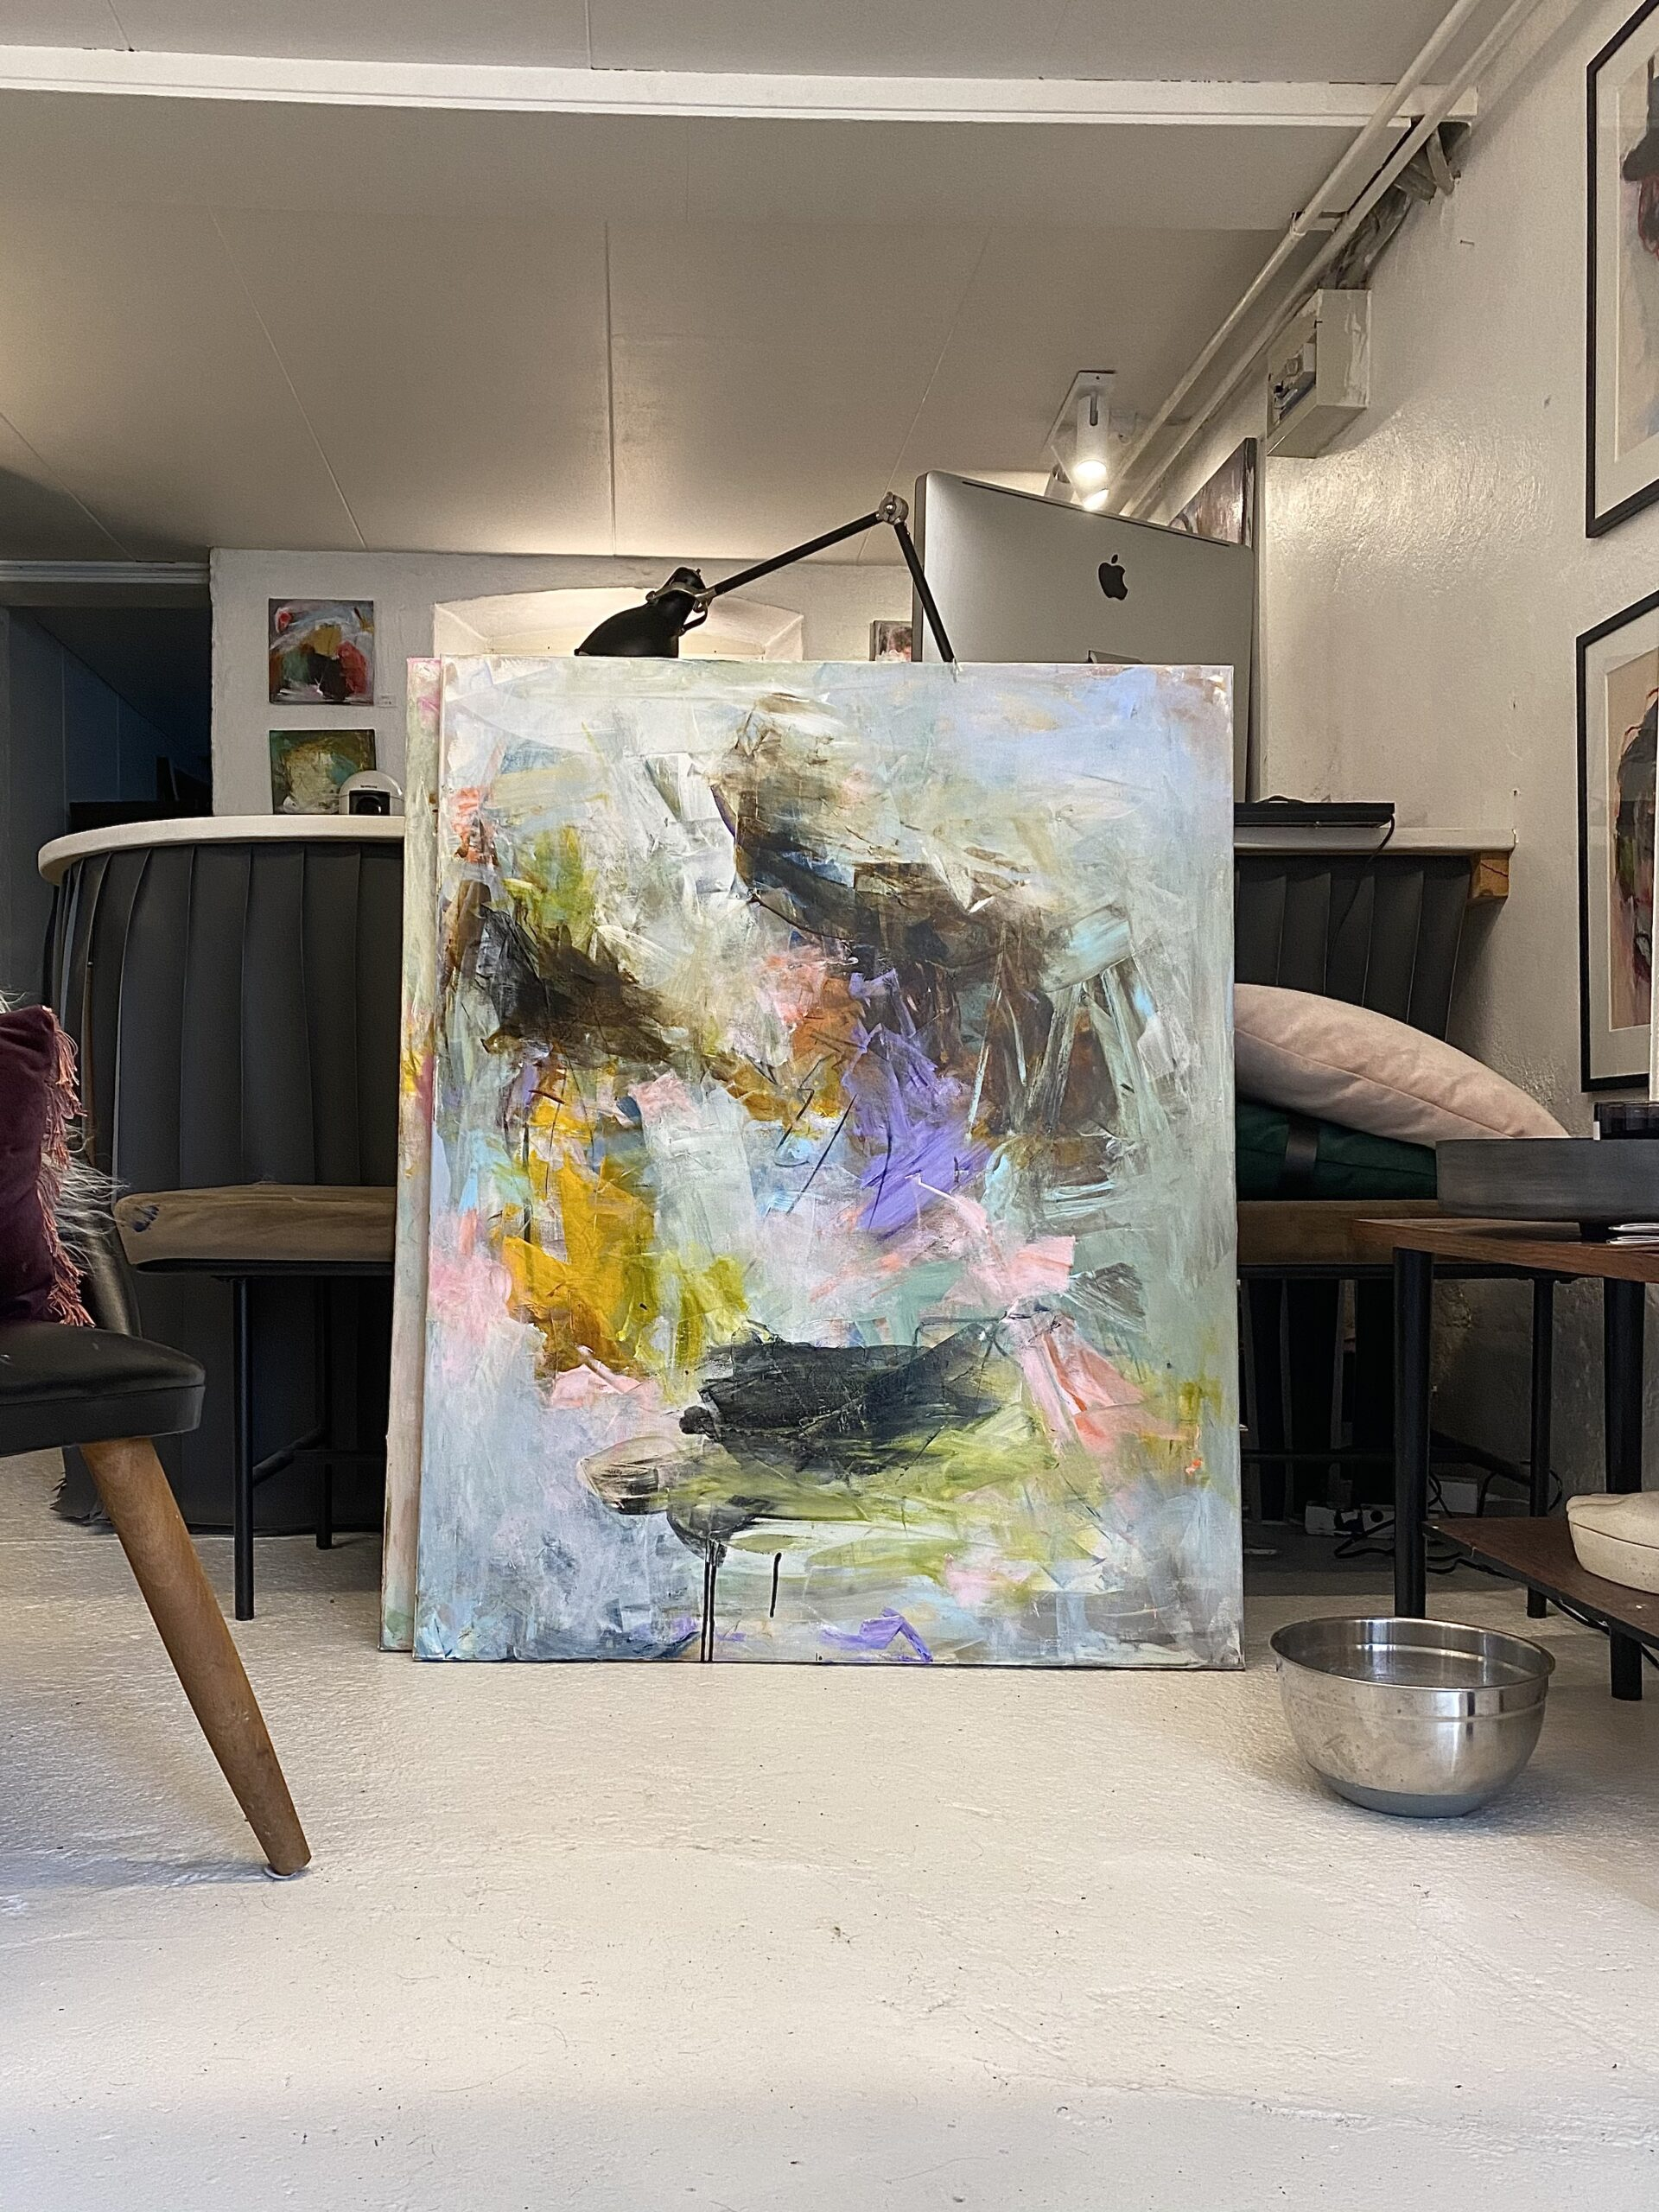 ART STUDIO KUL